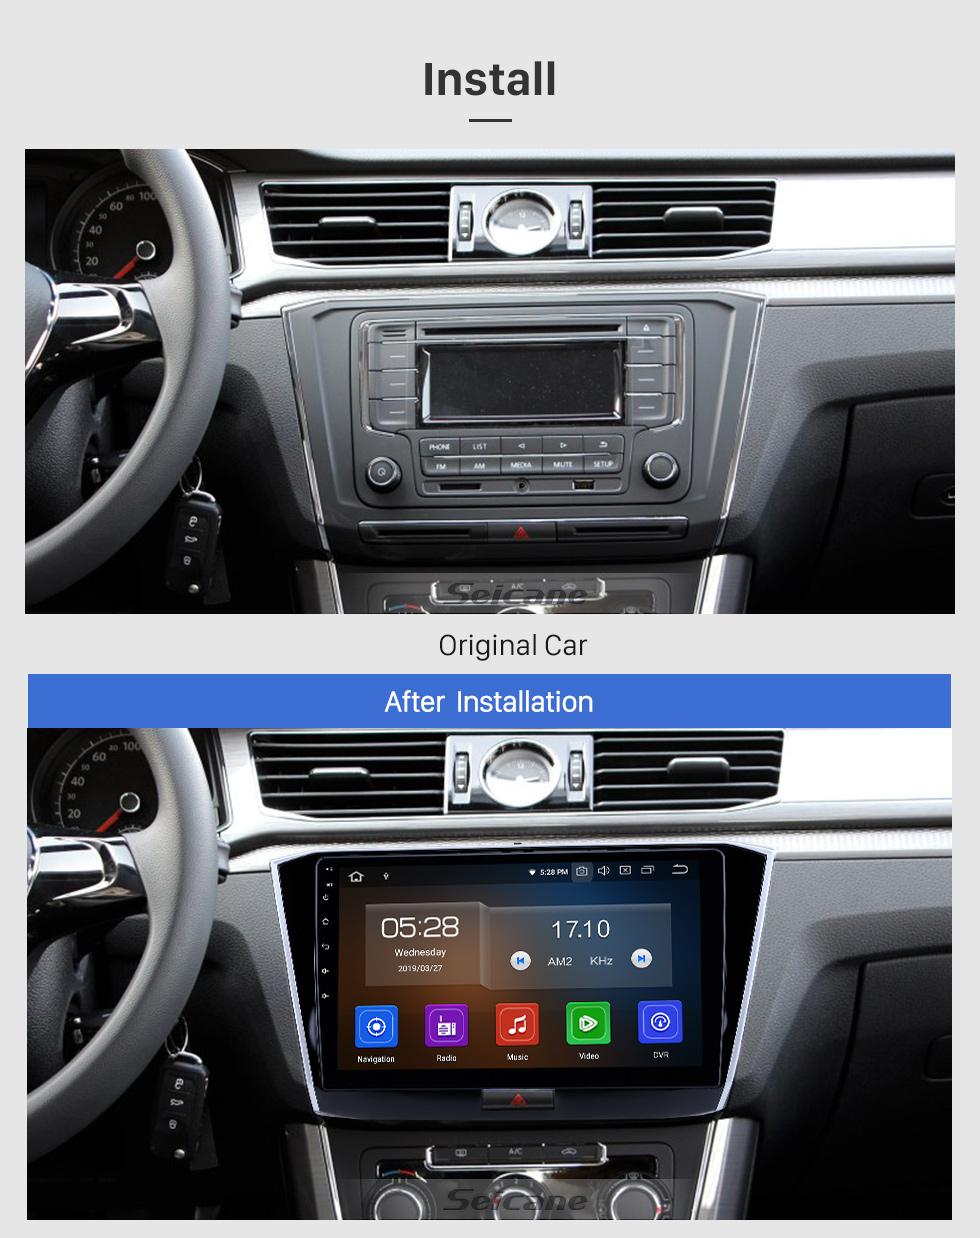 Seicane 10.1 pulgadas 2016-2018 VW Volkswagen Passat Android 9.0 Navegación GPS Radio Bluetooth HD Pantalla táctil AUX USB Carplay soporte Enlace espejo